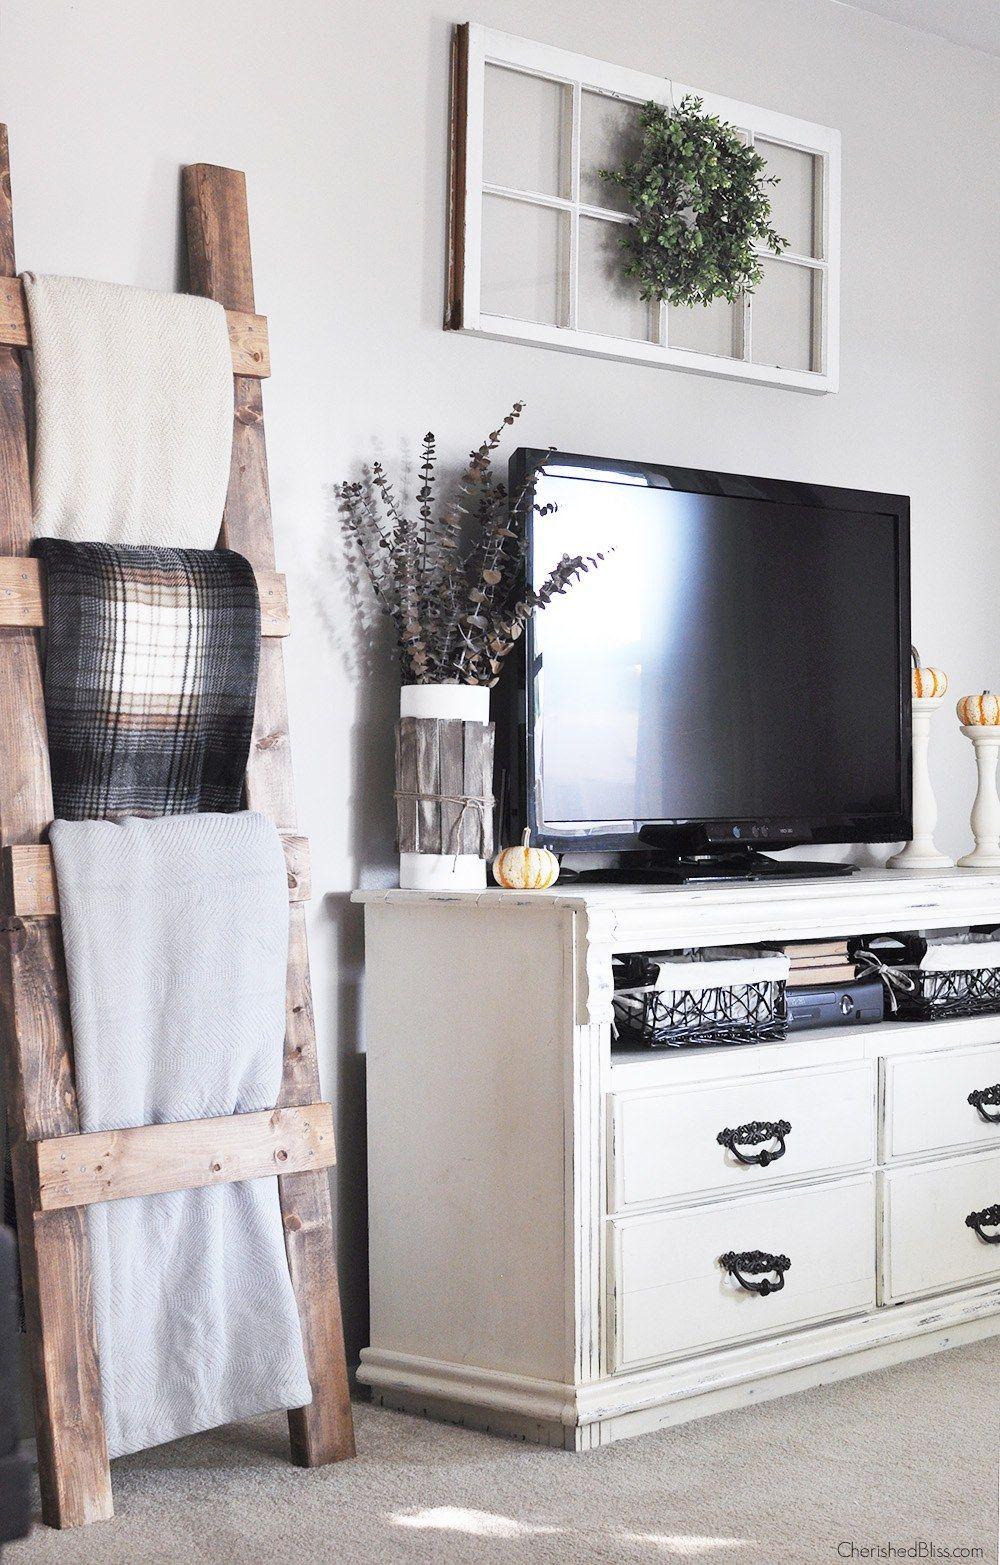 27 Rustic Farmhouse Living Room Decor Ideas for Your Home | Modern ...